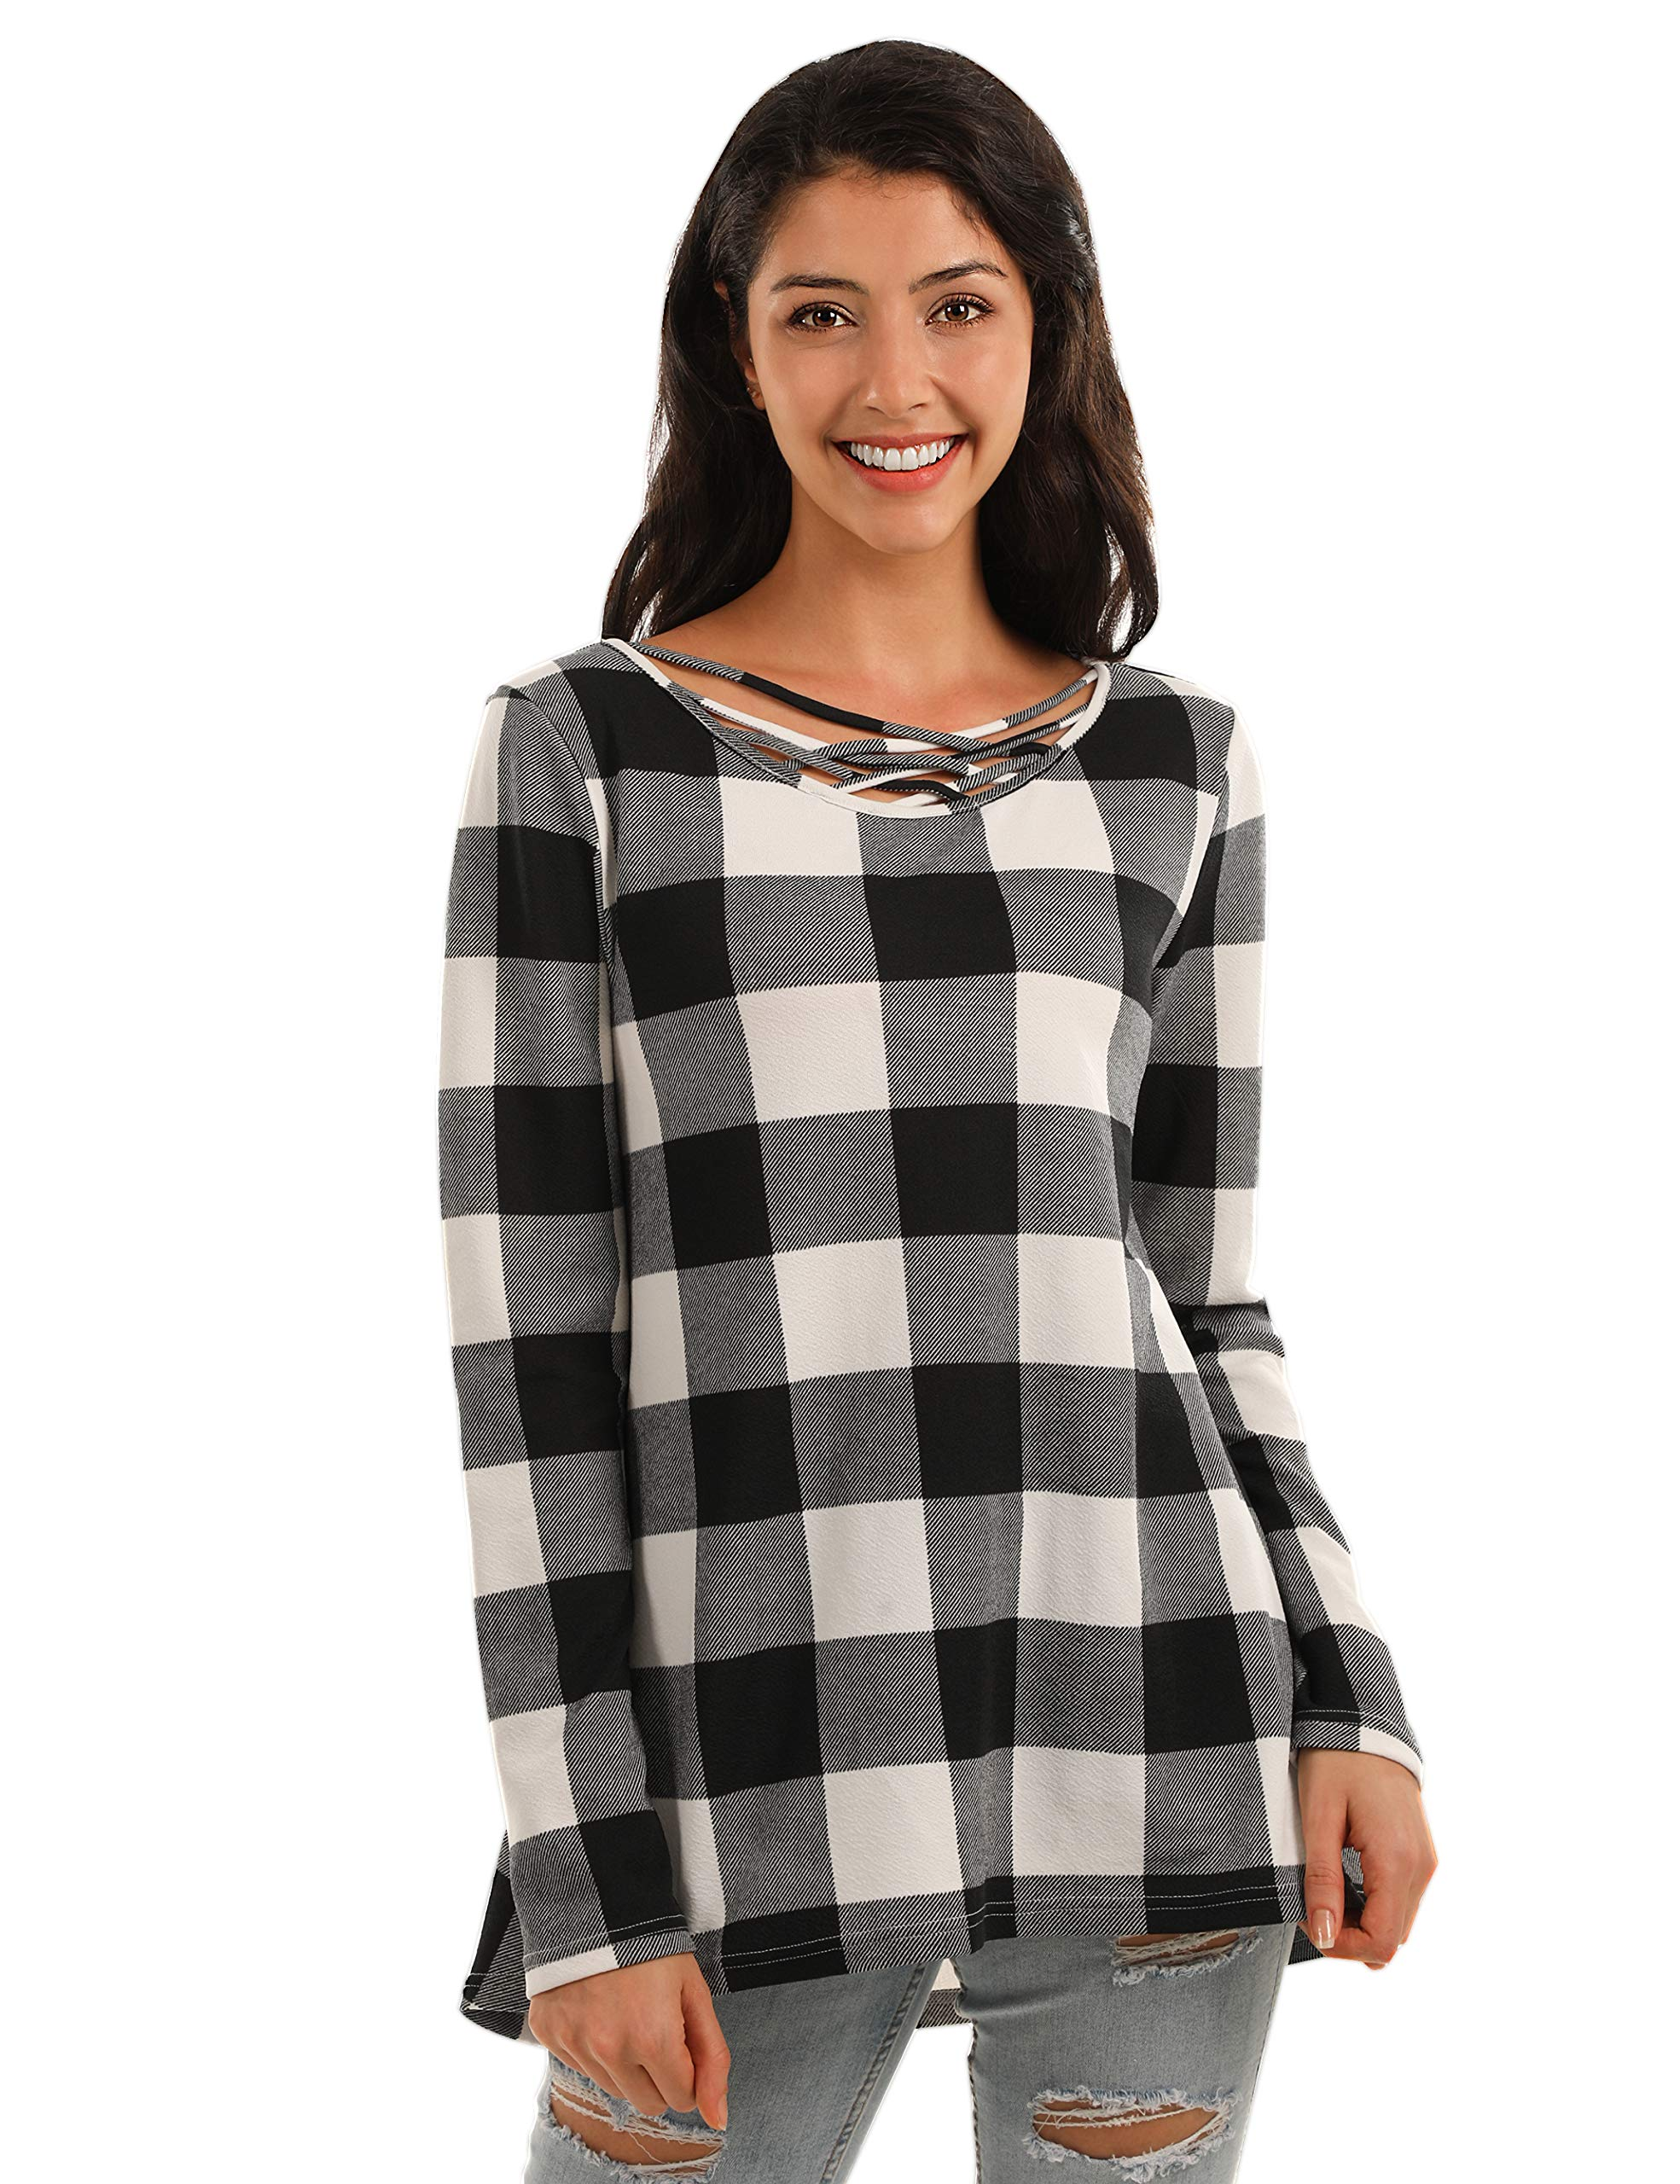 Women's plaid t shirt